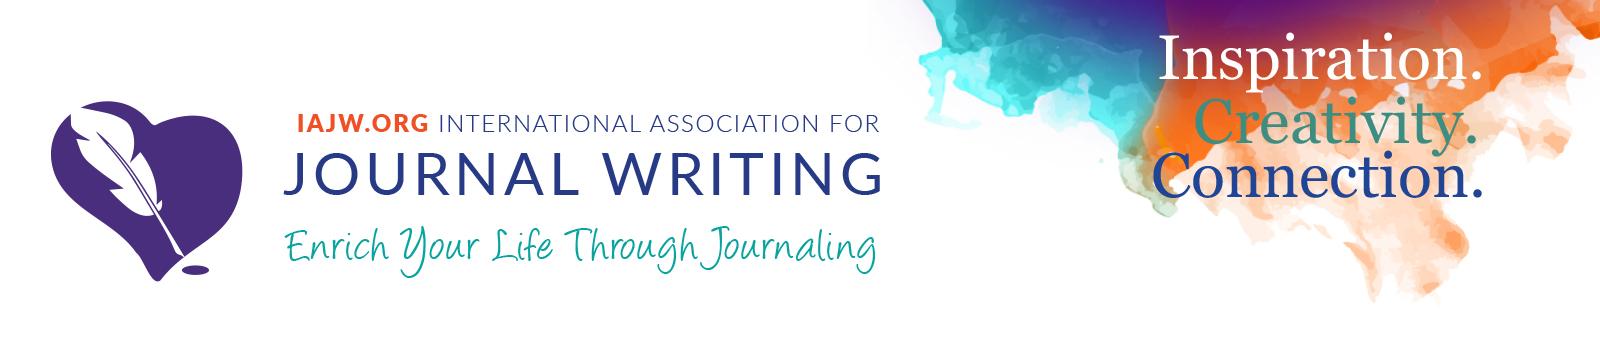 The International Association for Journal Writing Logo